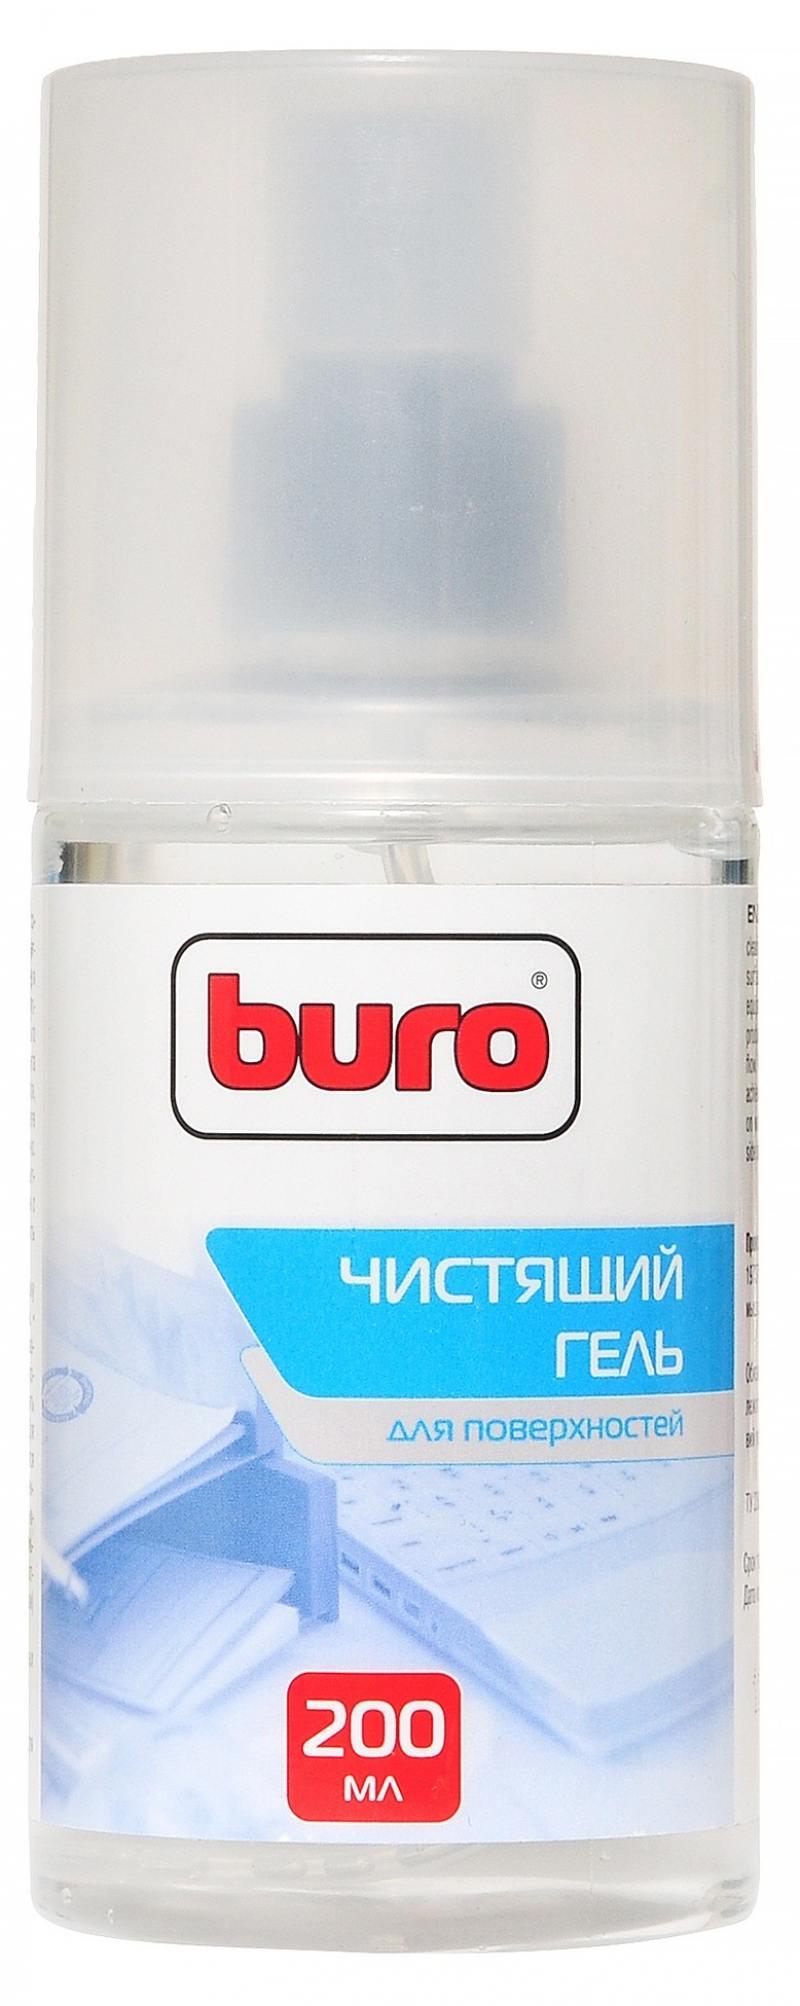 Набор для ухода за техникой BURO BU-GSURFACE 200 мл + салфетка из микрофибры цена